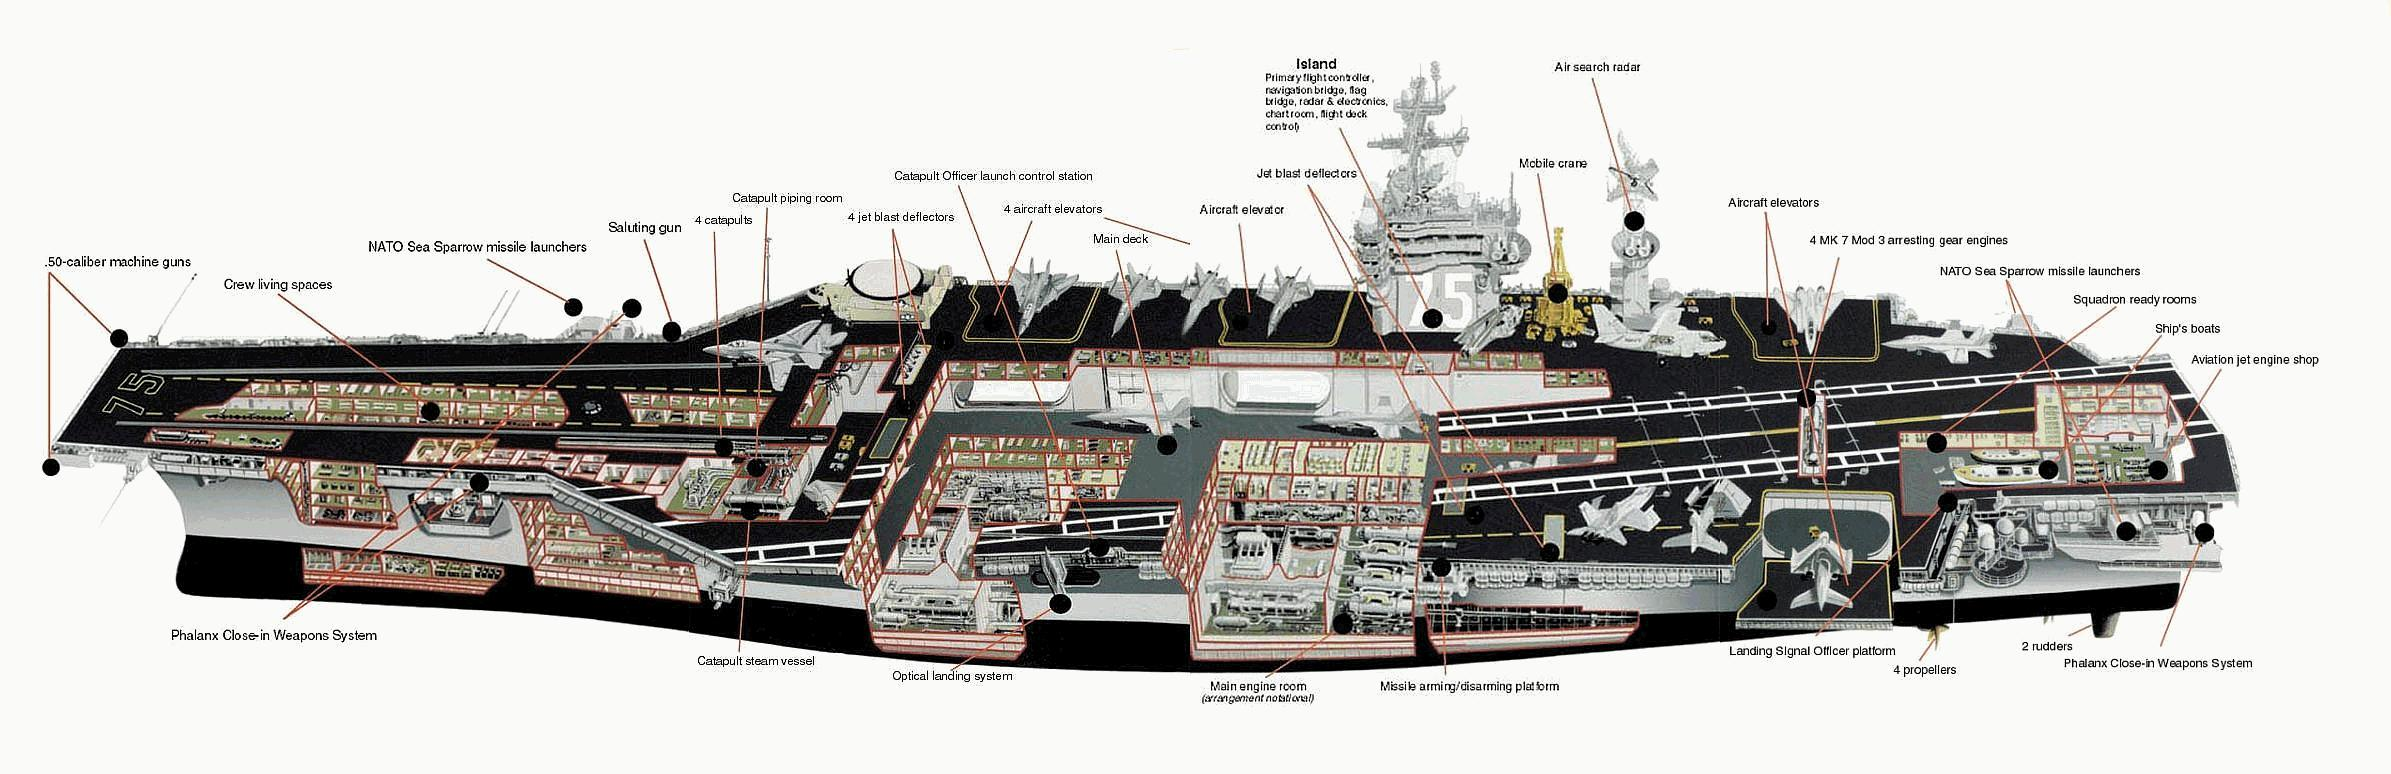 Hms Queen Elizabeth Deck 1 274 870 Pixlar Cross Sections Pinterest Deck Plans